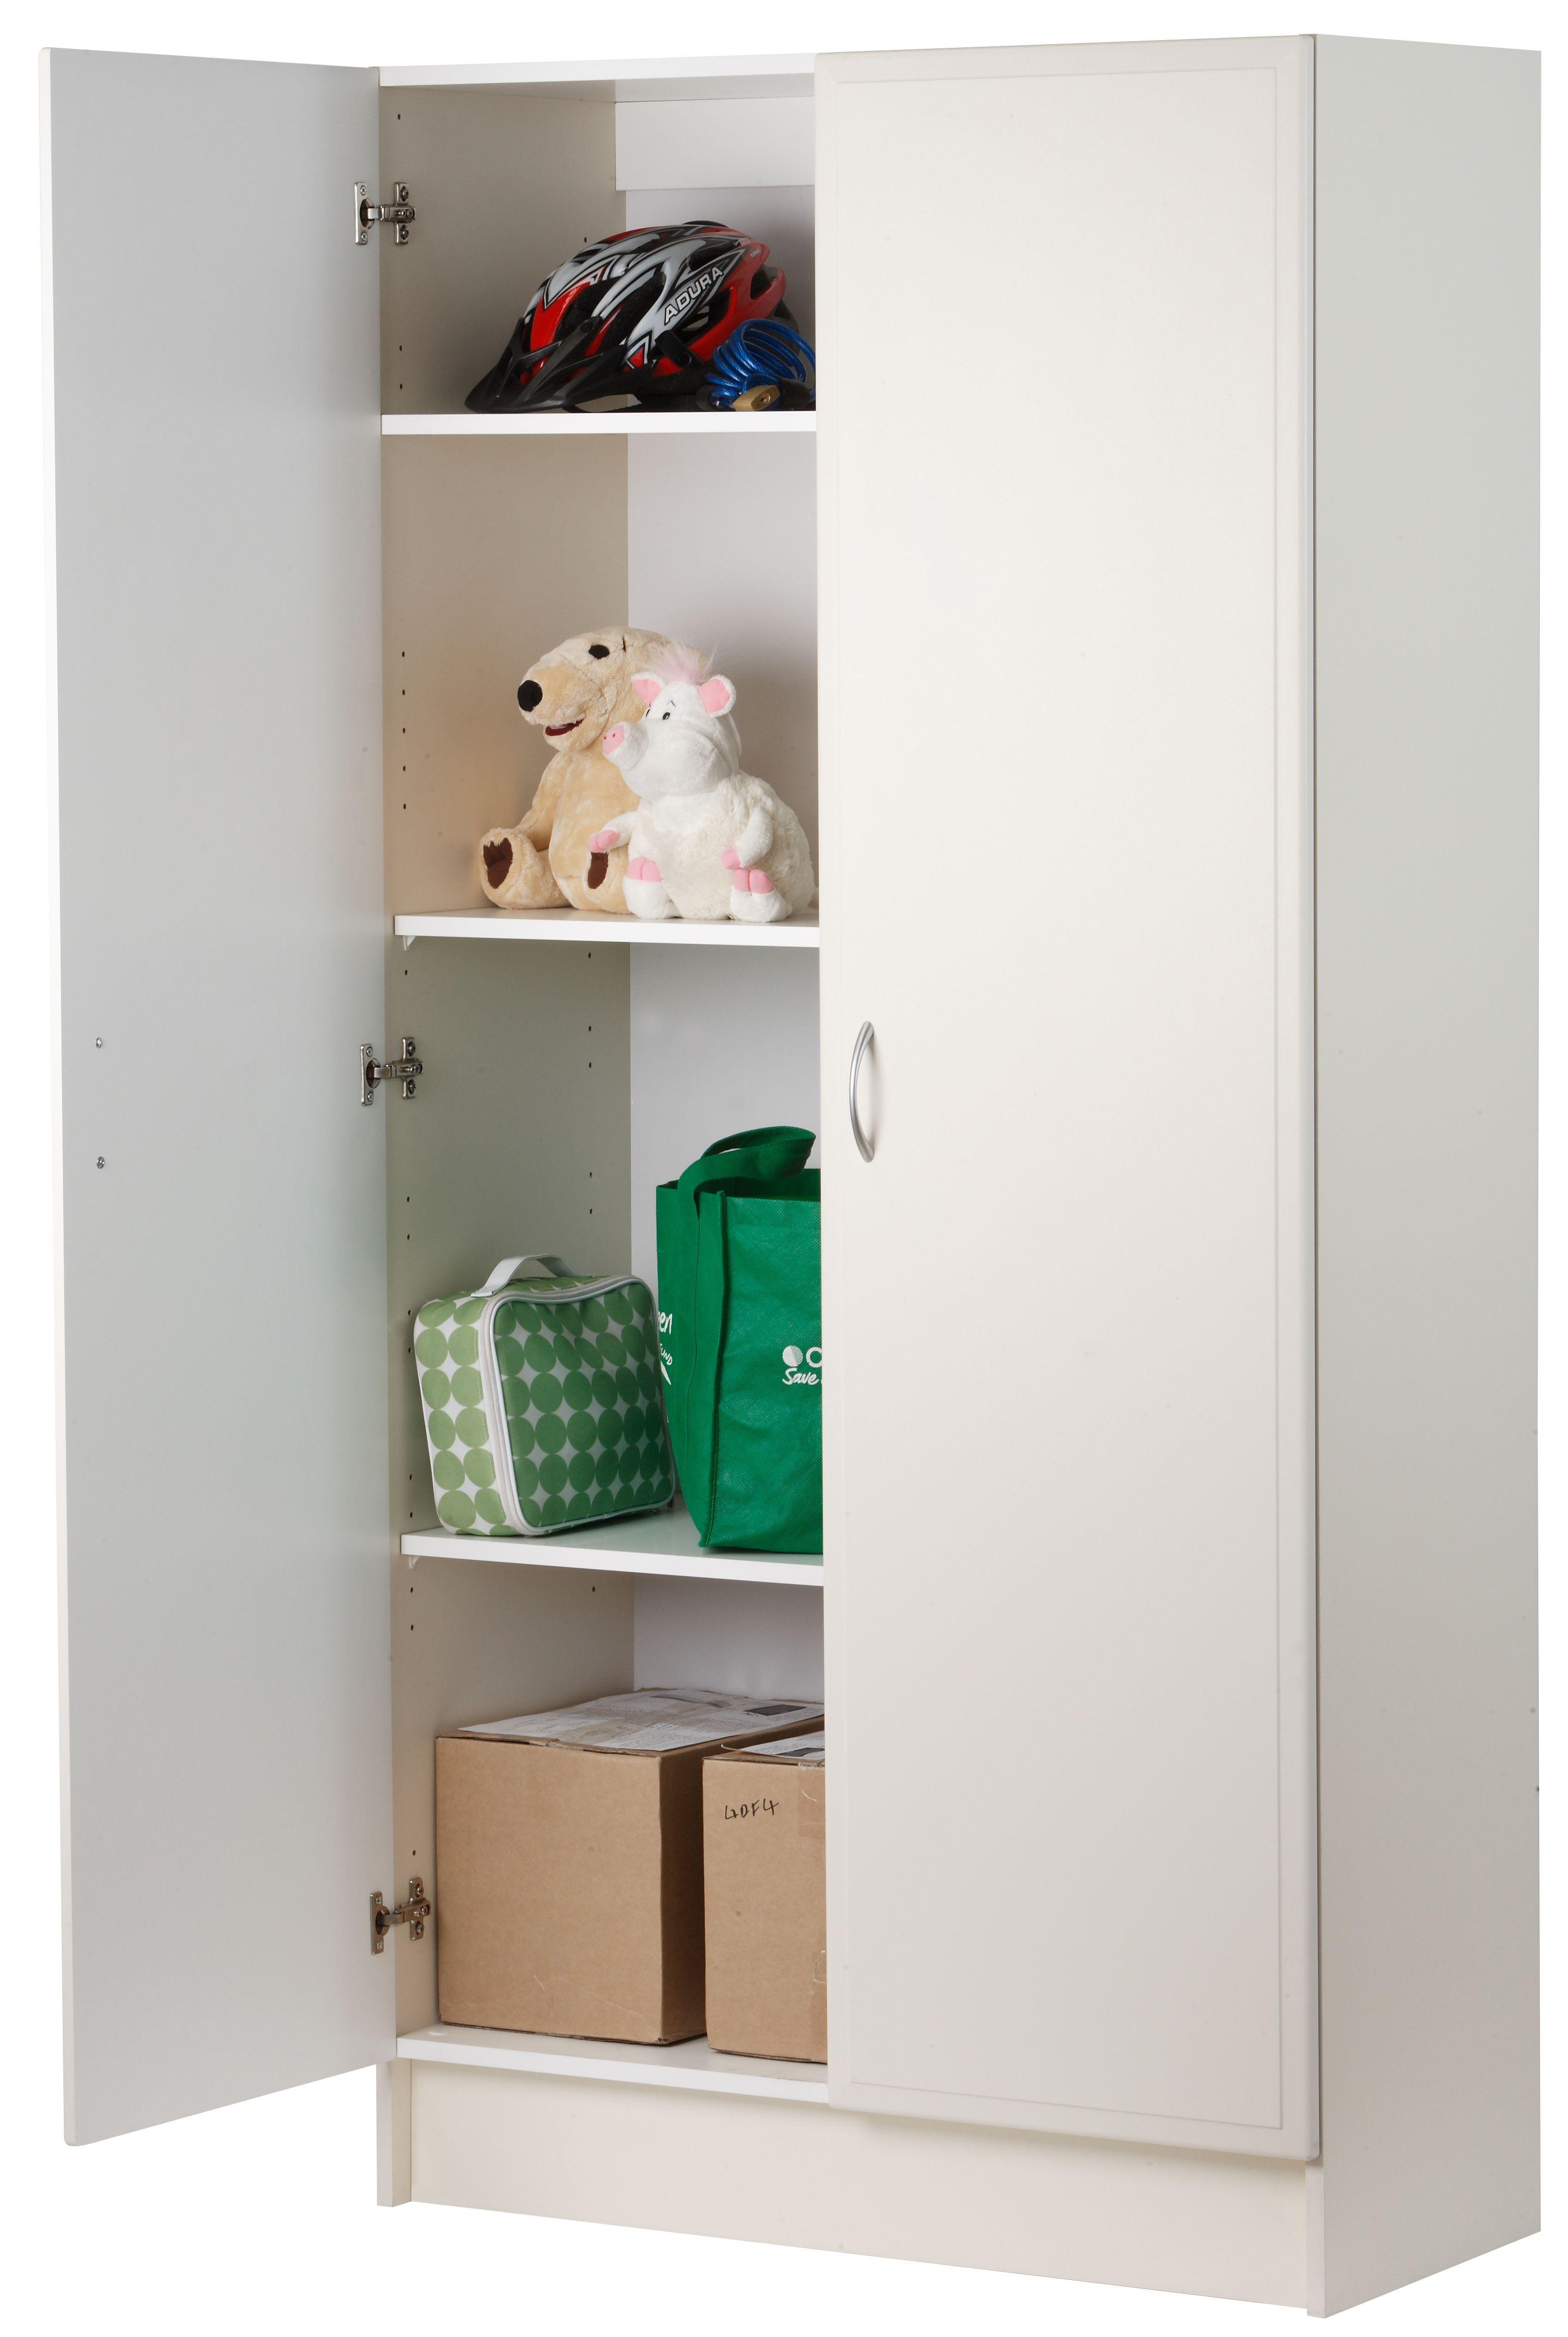 Best Bedford 900Mm White 2 Door Pantry Bunnings Warehouse 400 x 300